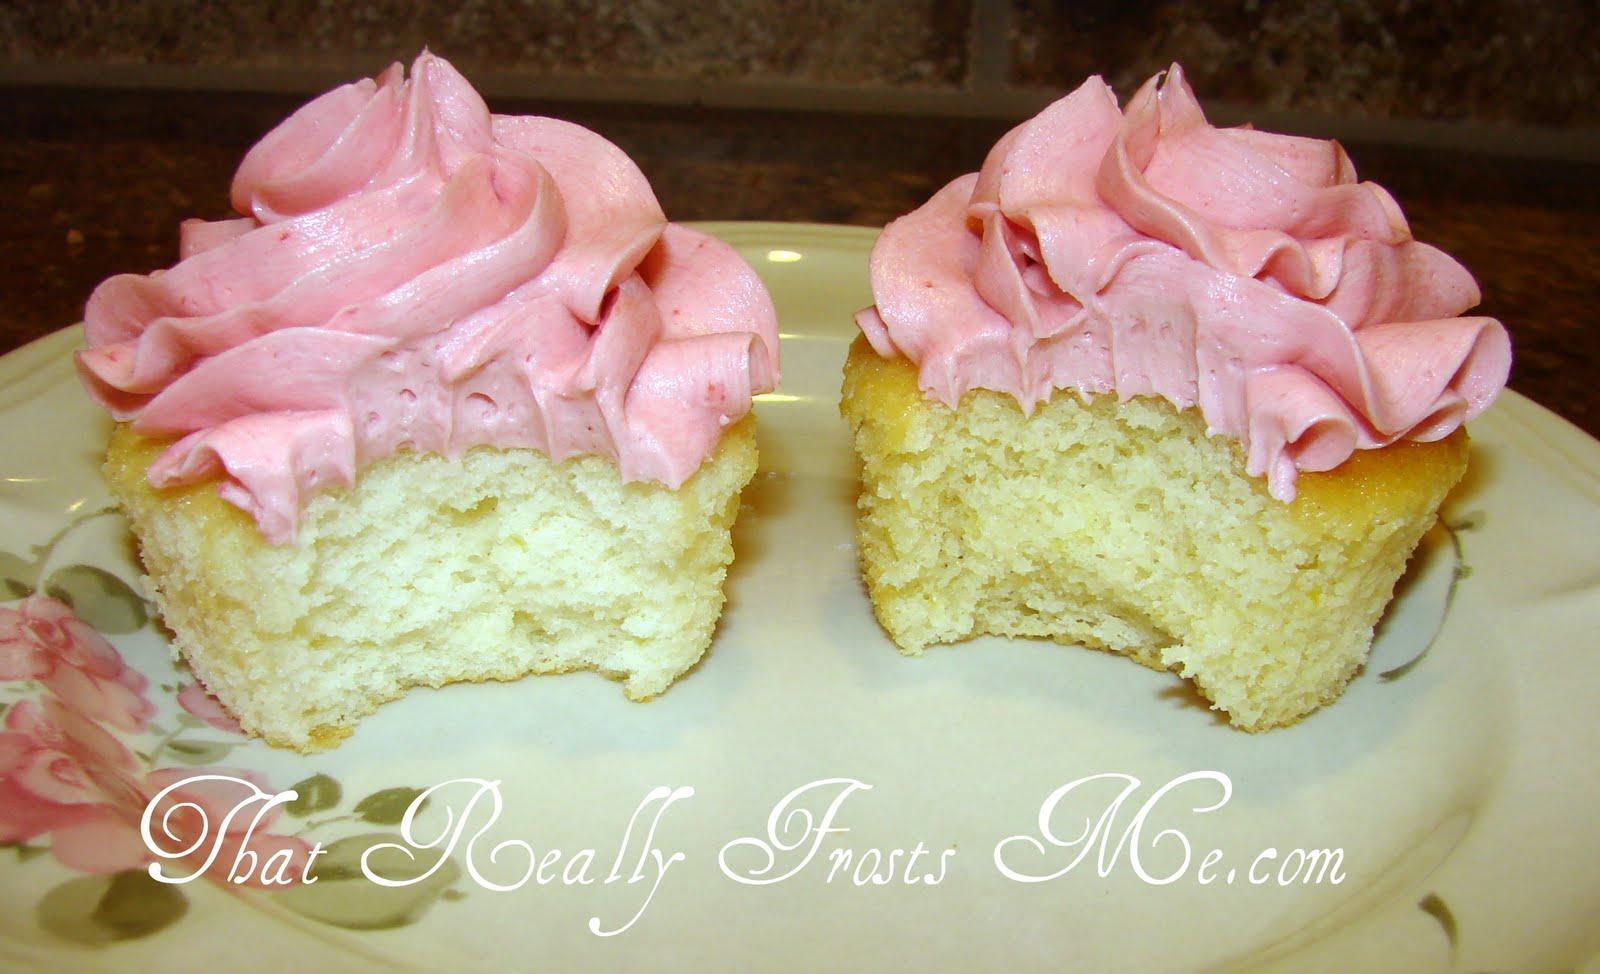 Cake Flour Vs All Purpose Flour For Cupcakes